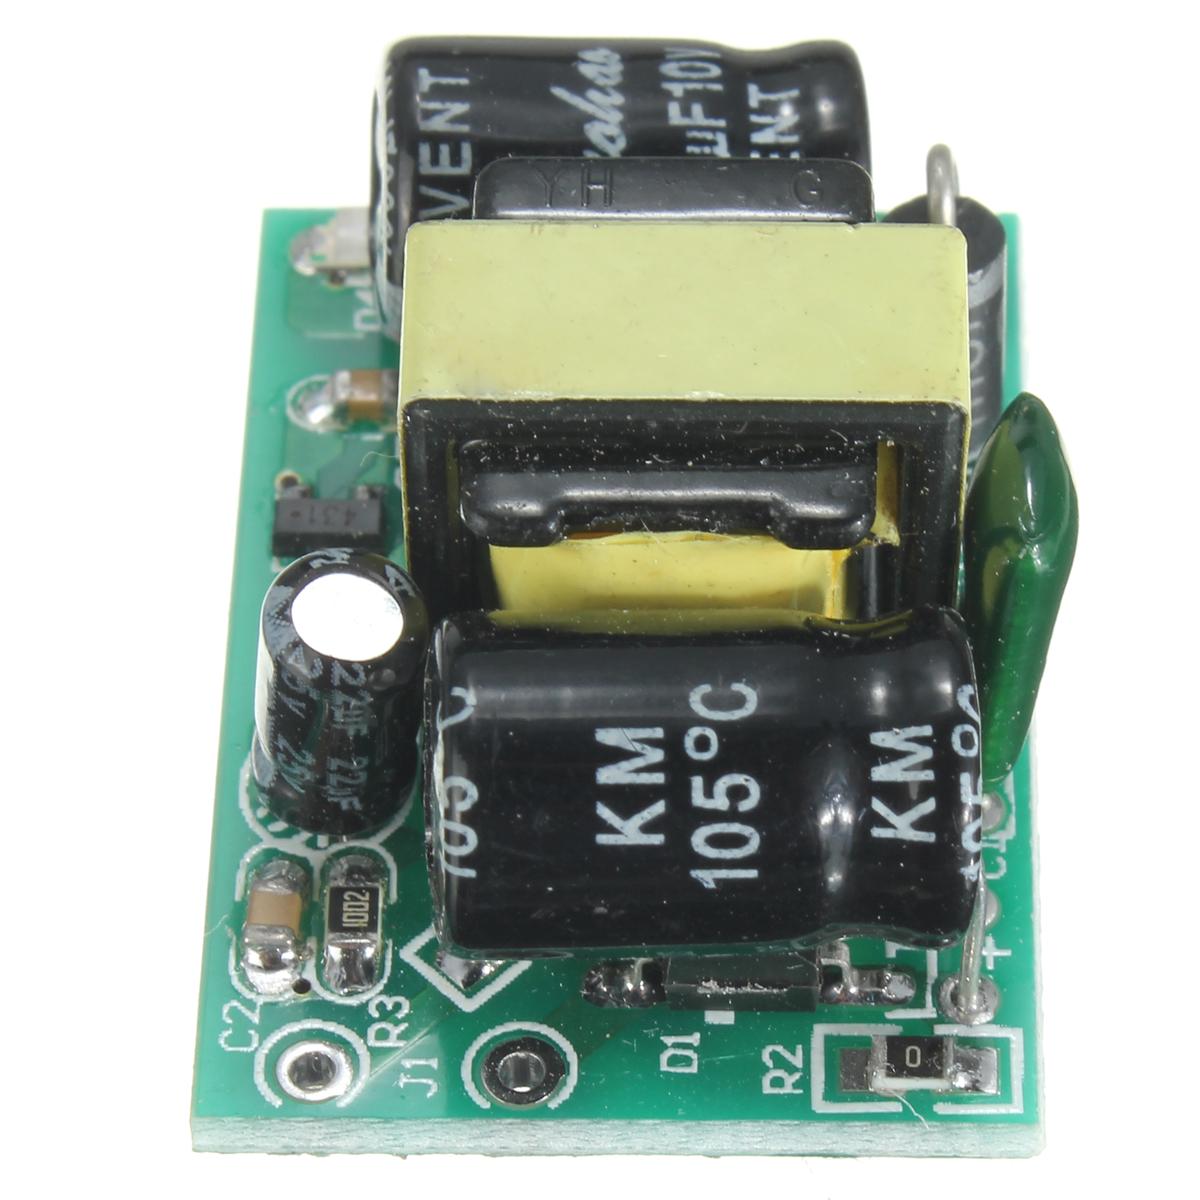 Details about 12V/5V/3.3V/9V AC-DC Power Supply Buck Converter Adapter ...